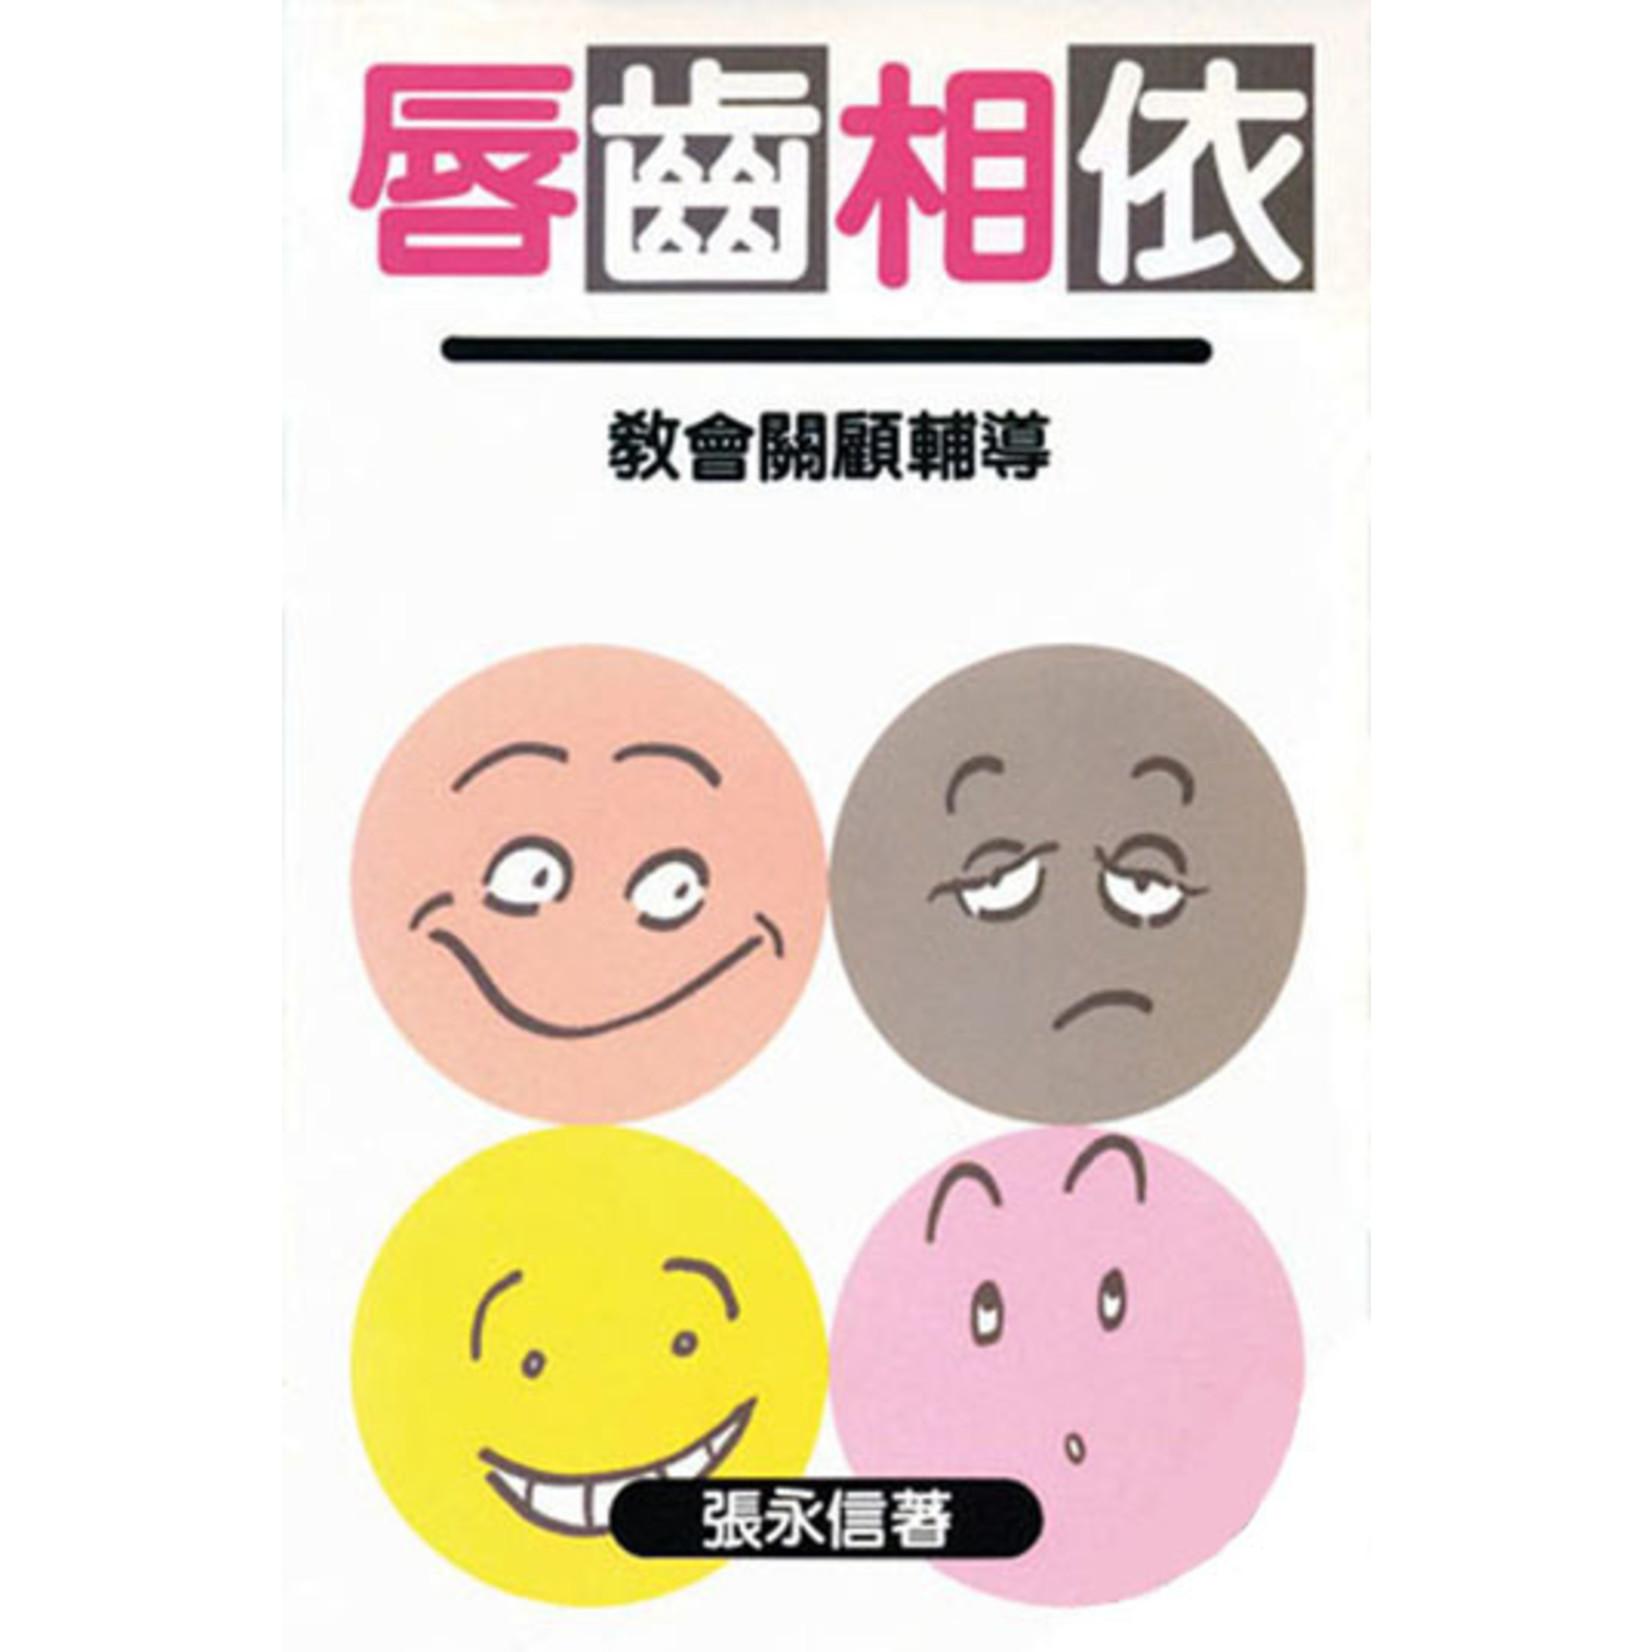 天道書樓 Tien Dao Publishing House 唇齒相依:教會關顧輔導